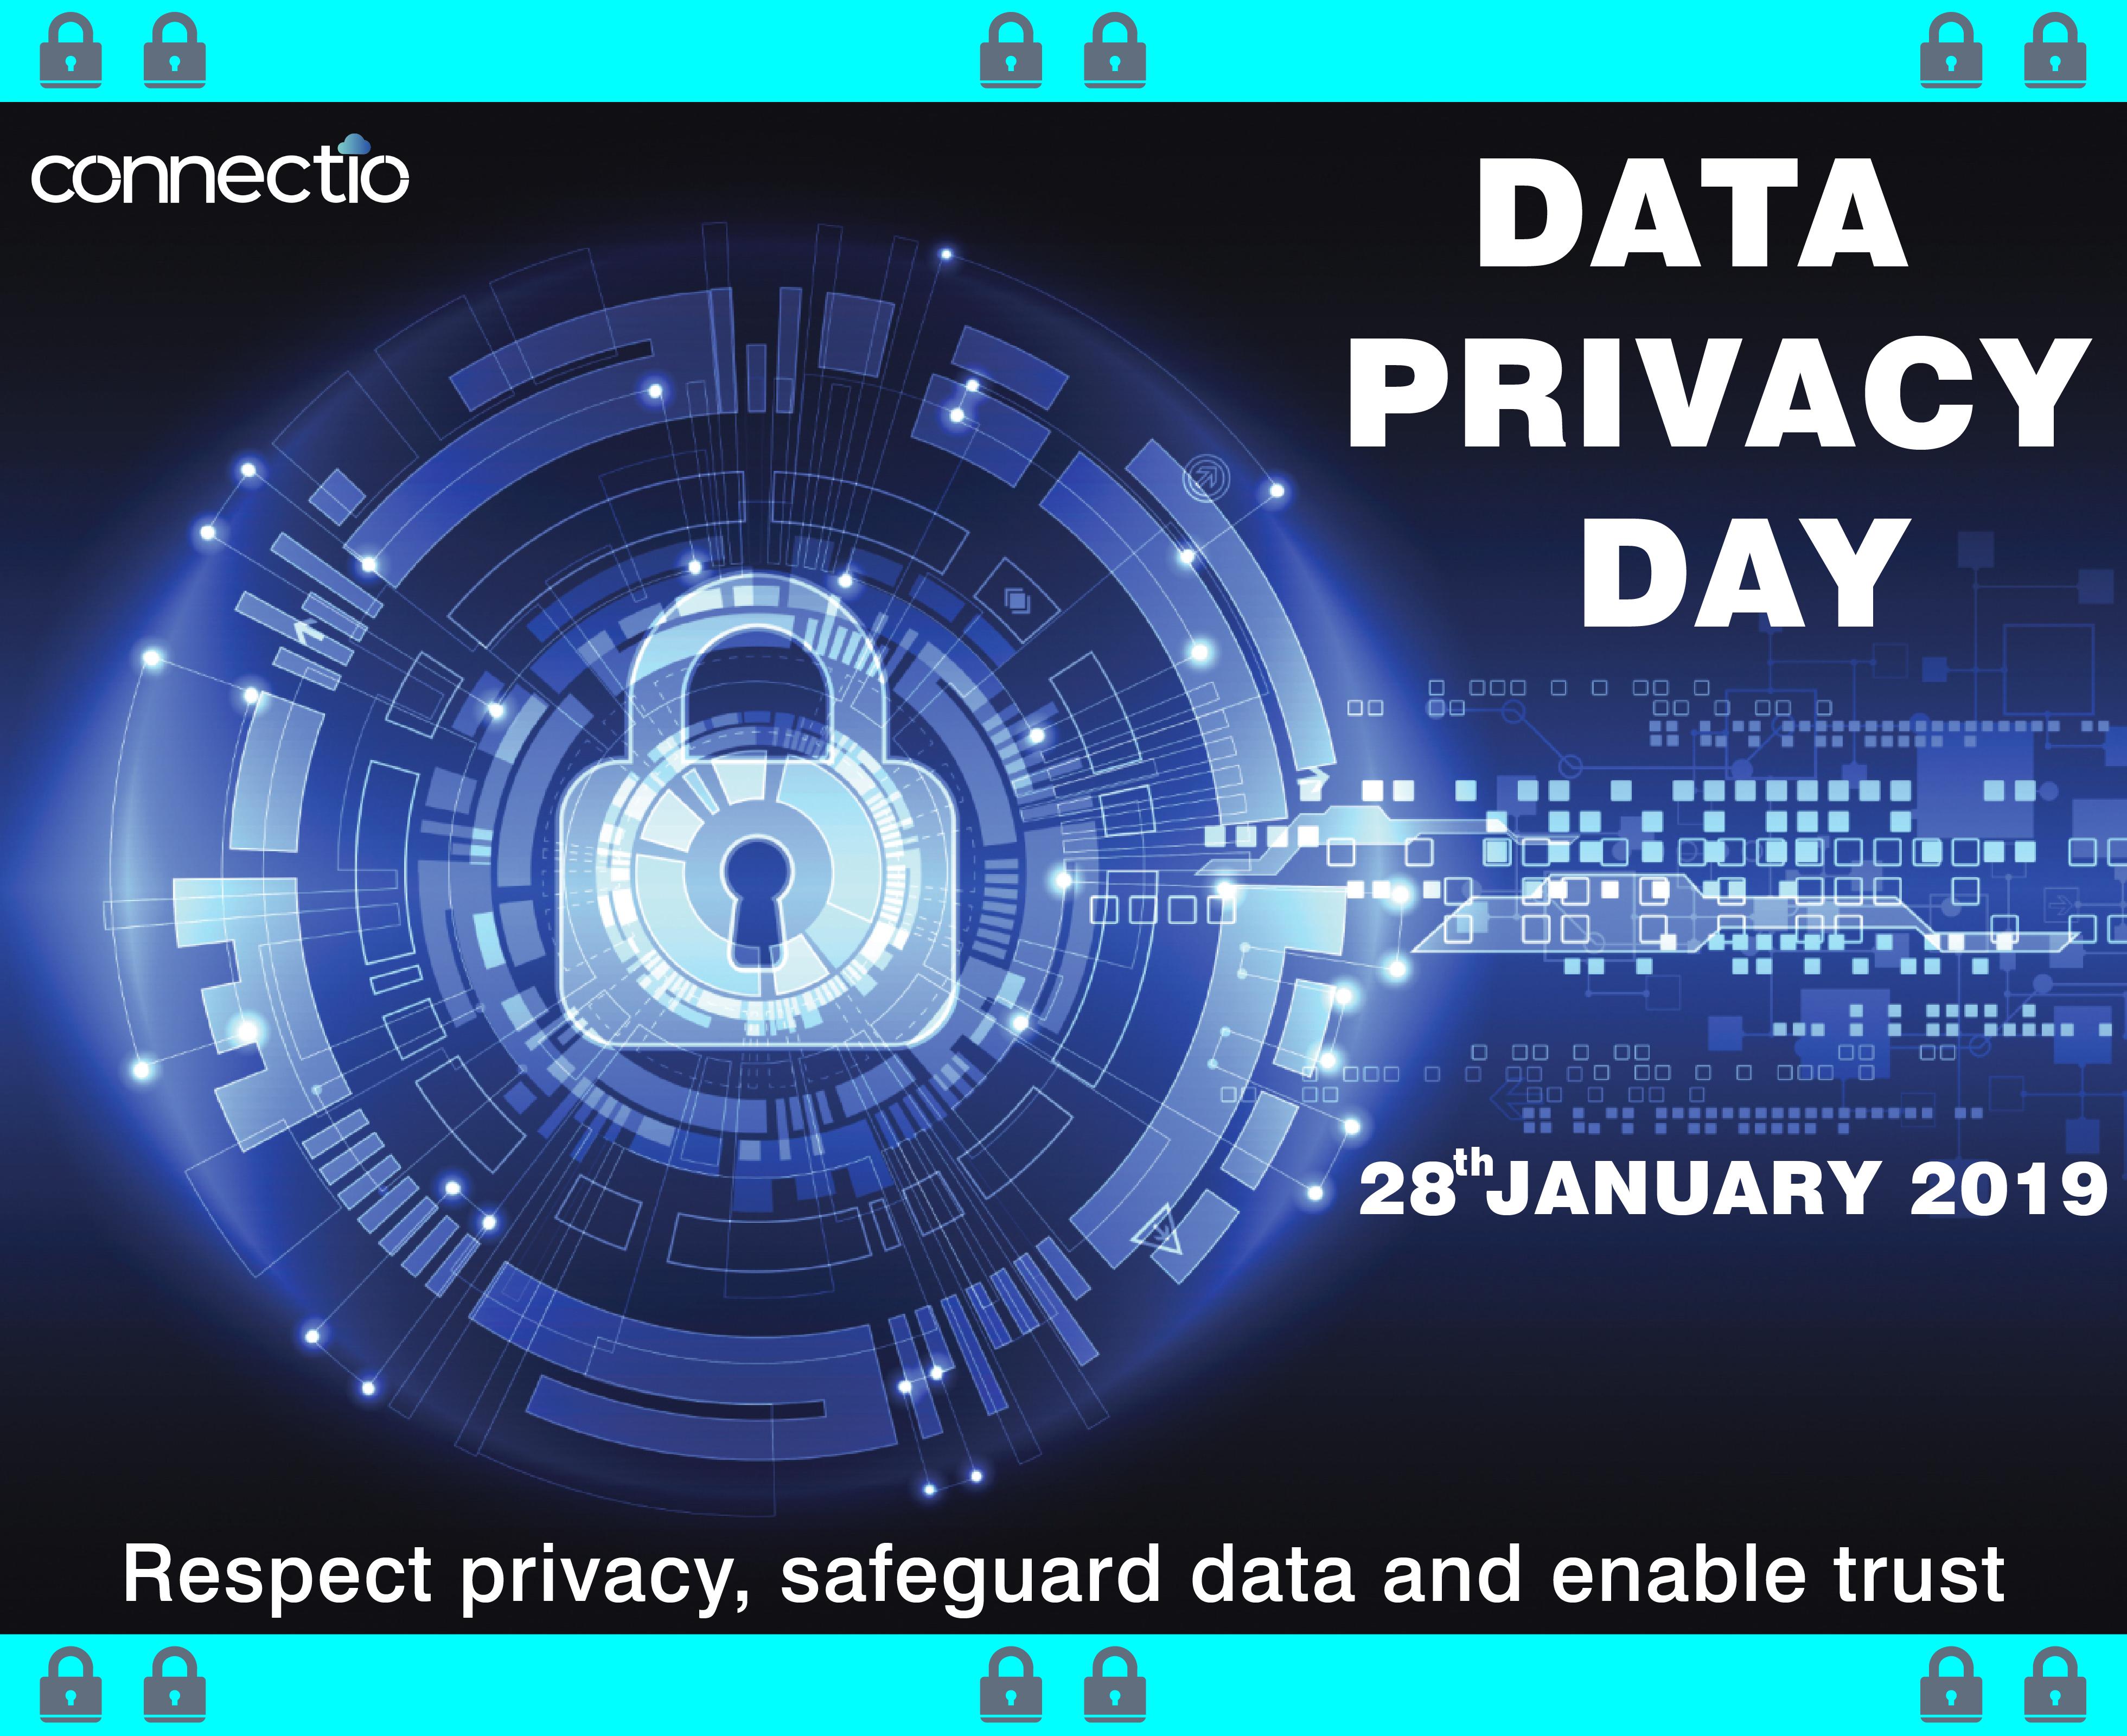 Happy Data Privacy Day! Respect privacy, safeguard data